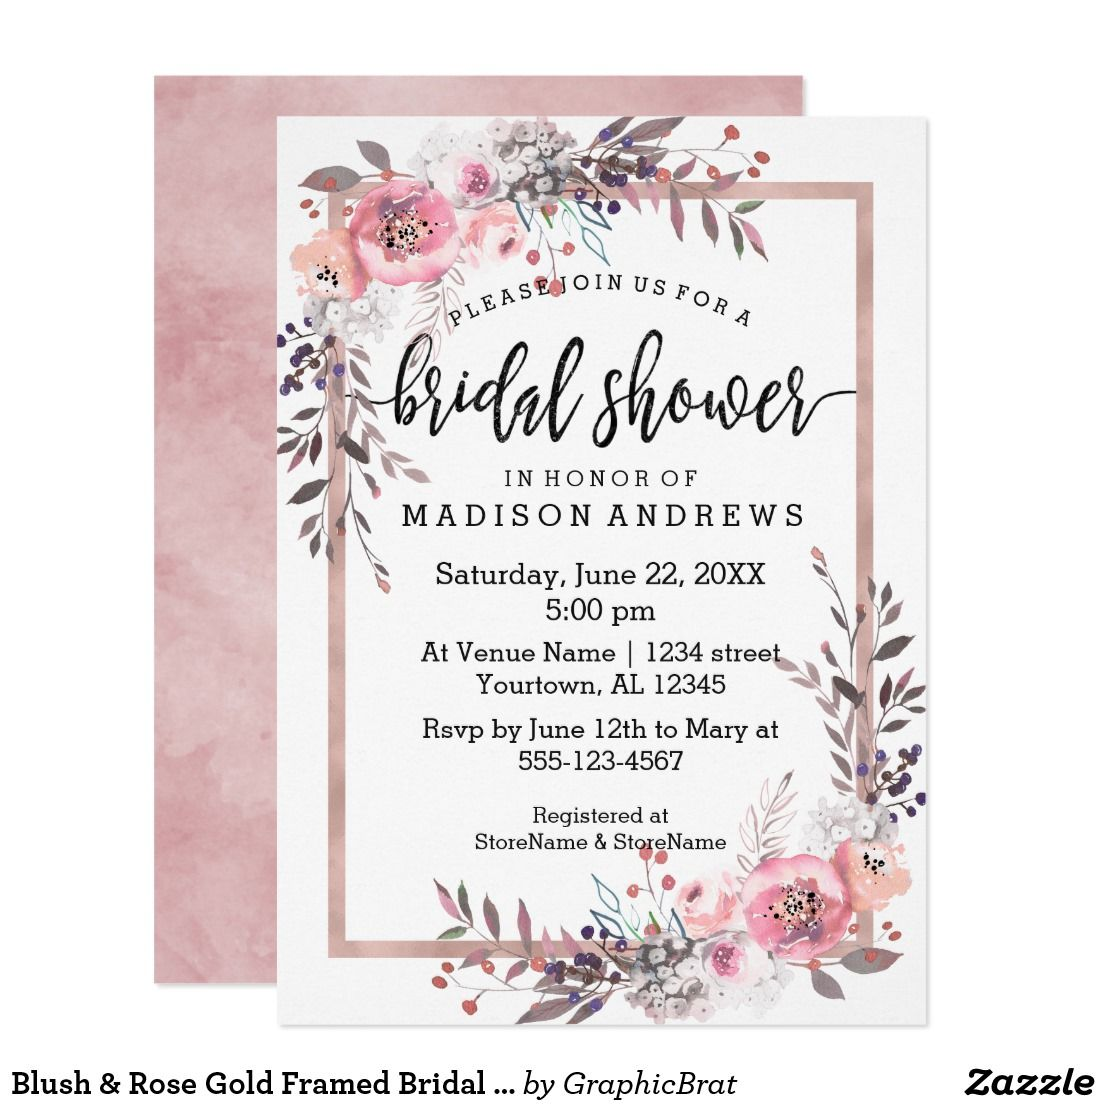 Peony Blush Pink Gold Bridal Shower Invitations Zazzle Com In 2020 Peony Wedding Invitations Gold Bridal Shower Invitations Gold Wedding Invitations